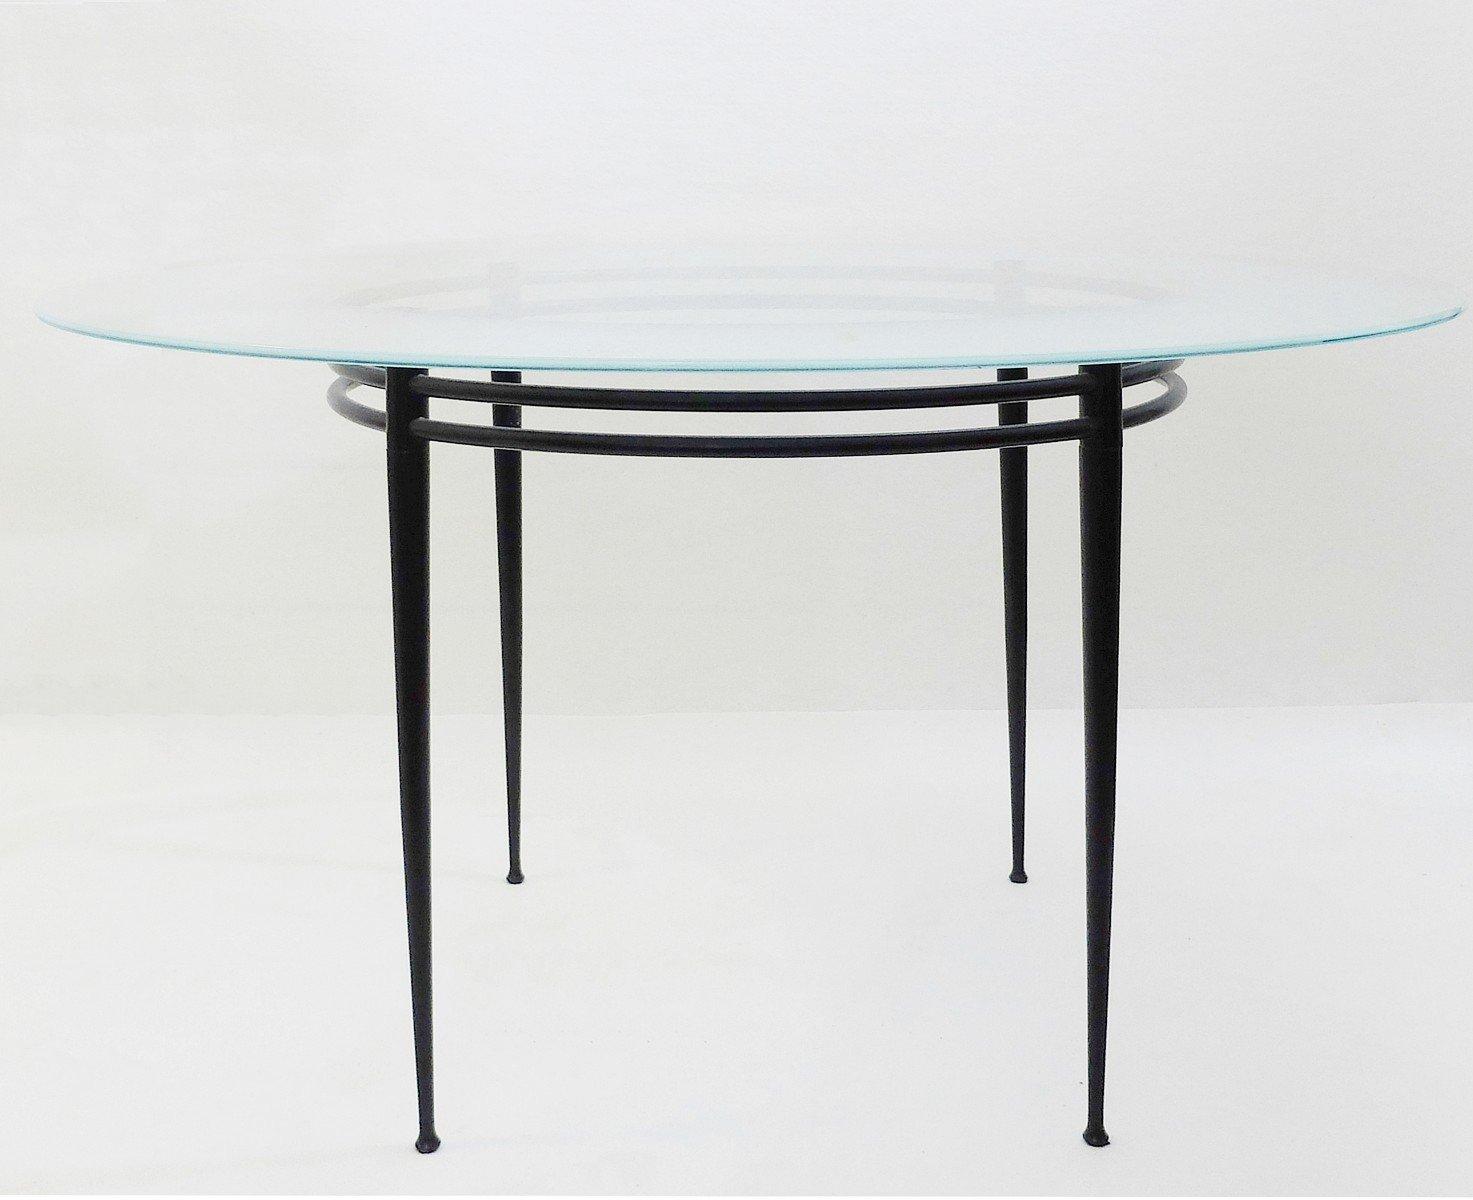 hoher lunar tisch von pascal mourgue f r artelano 1980er cafe konrad vib. Black Bedroom Furniture Sets. Home Design Ideas